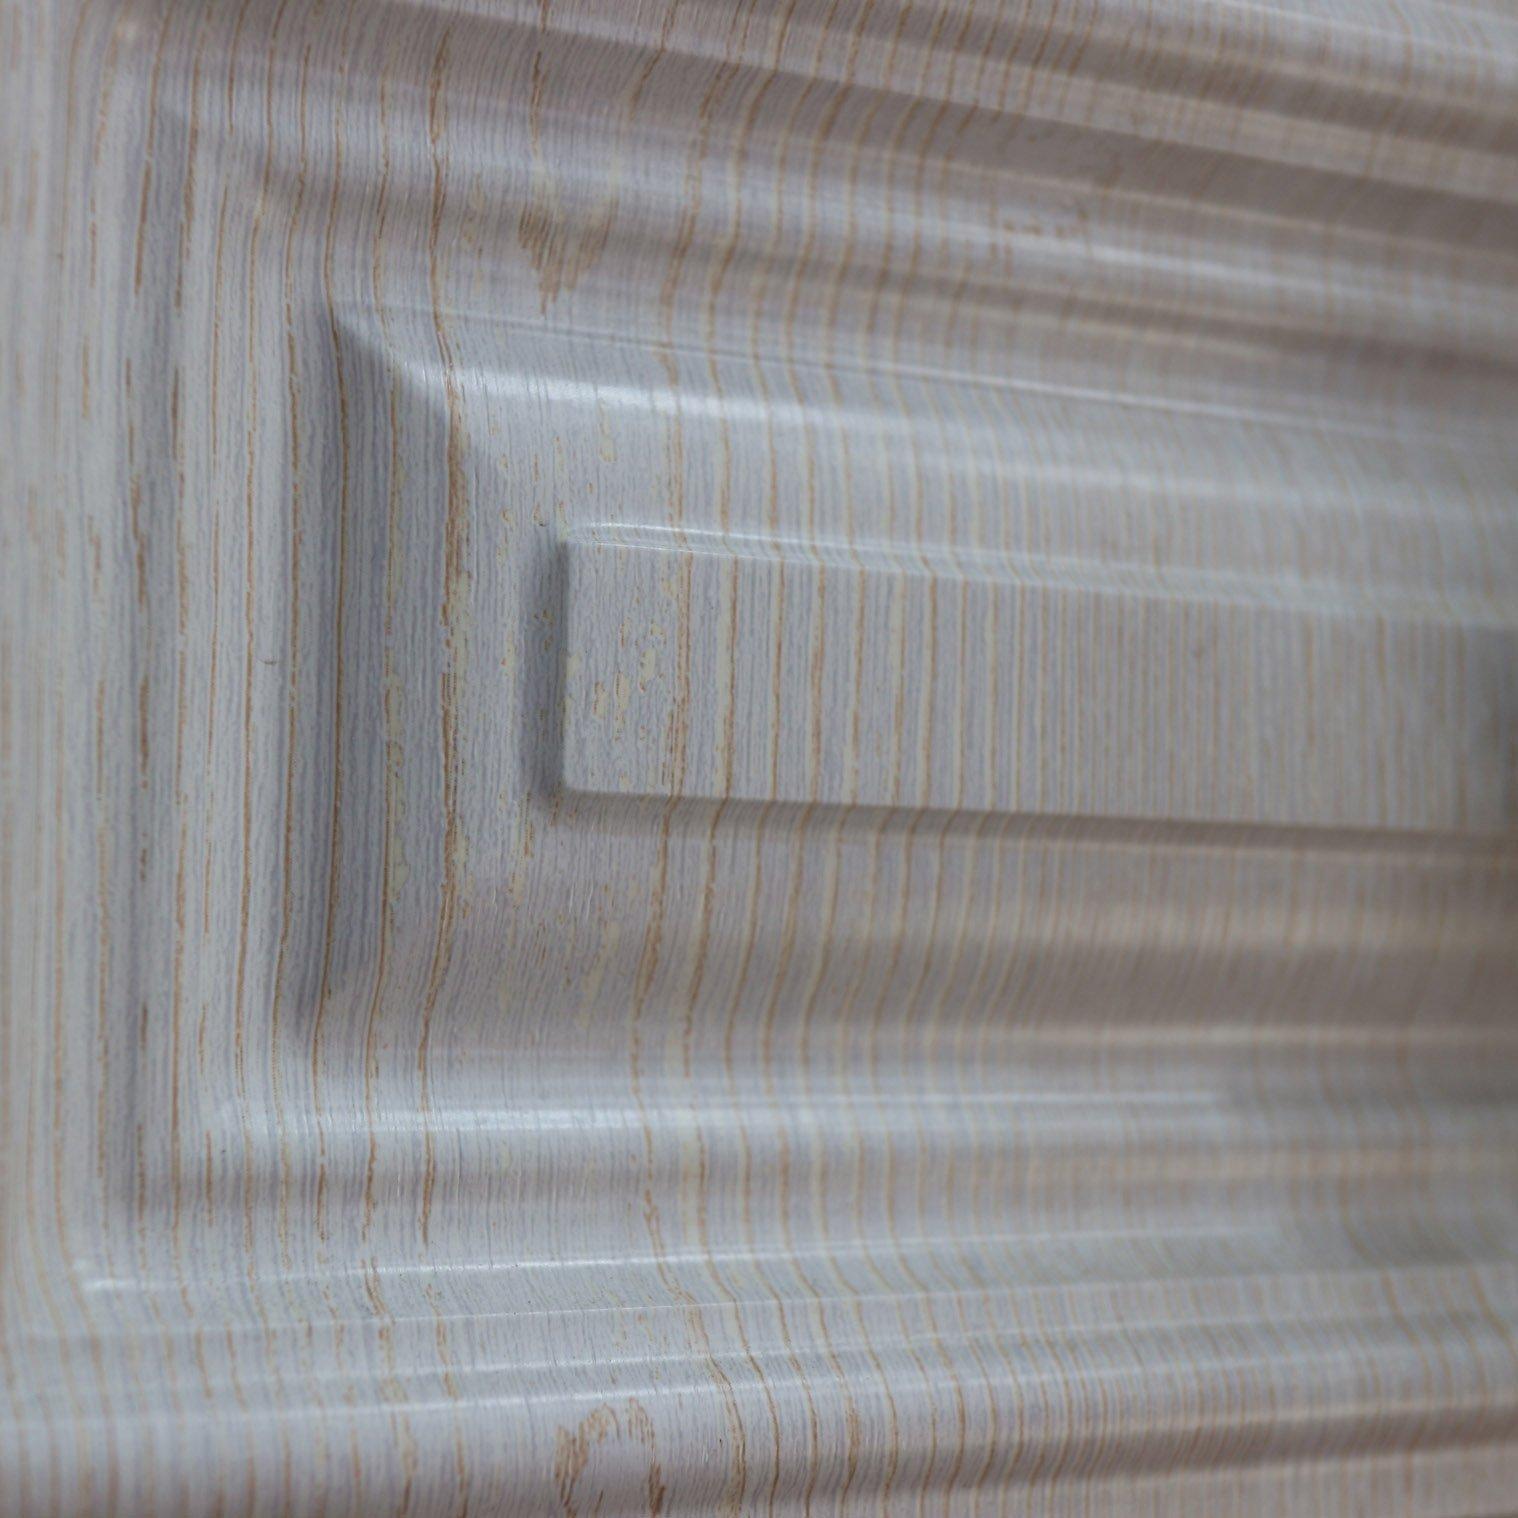 PVC film idecor master decor wrapping profile vacuum